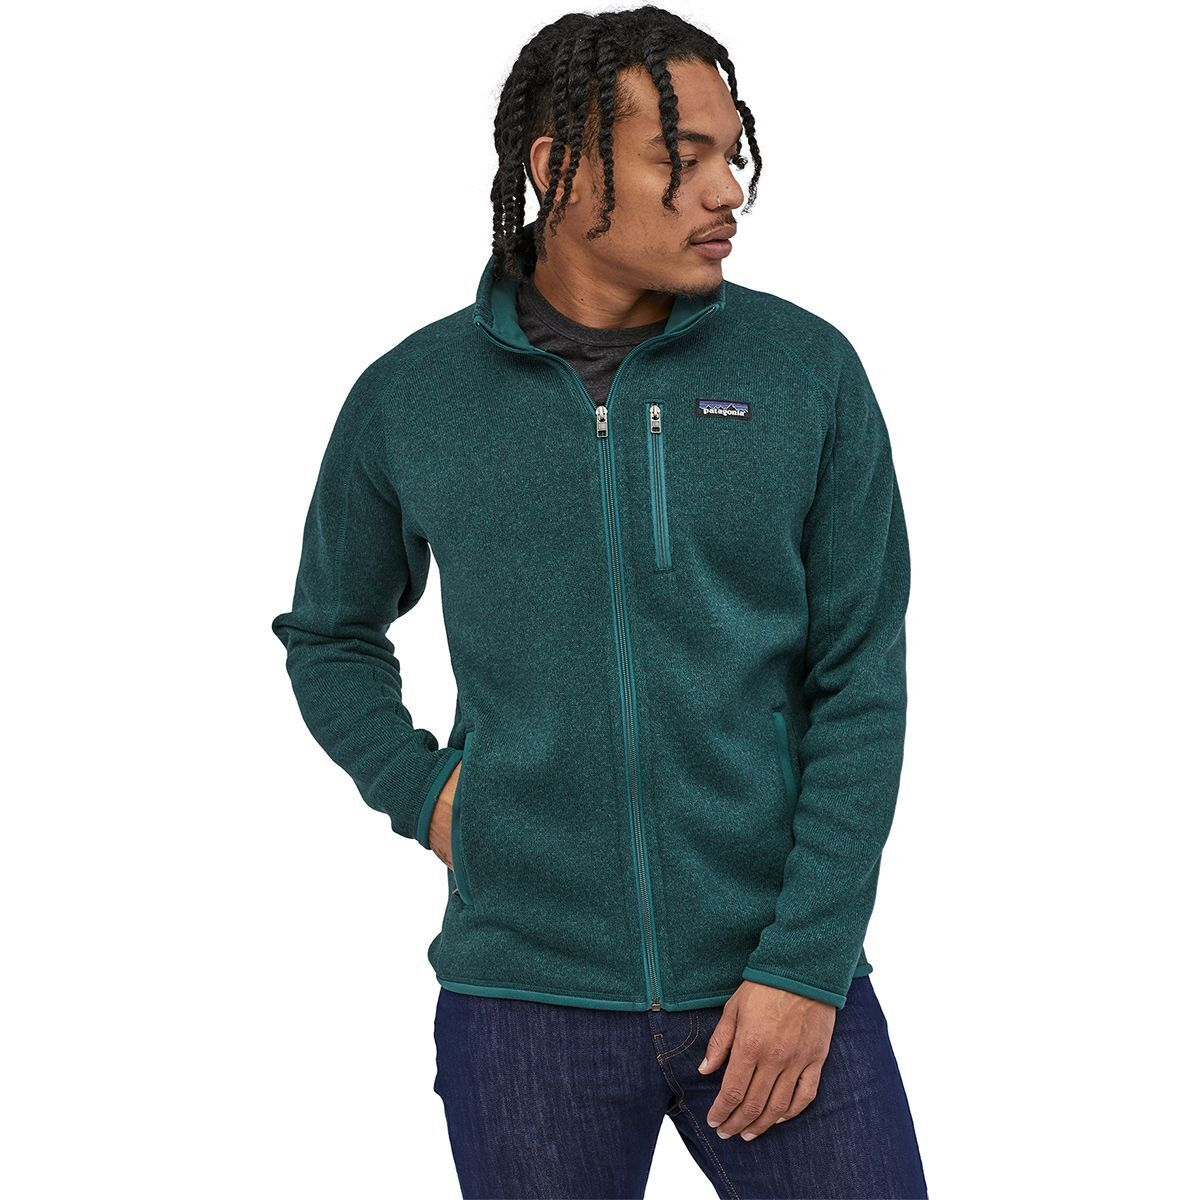 giacca Uomo PATAGONIA Ms Lw Better Sweater Jkt